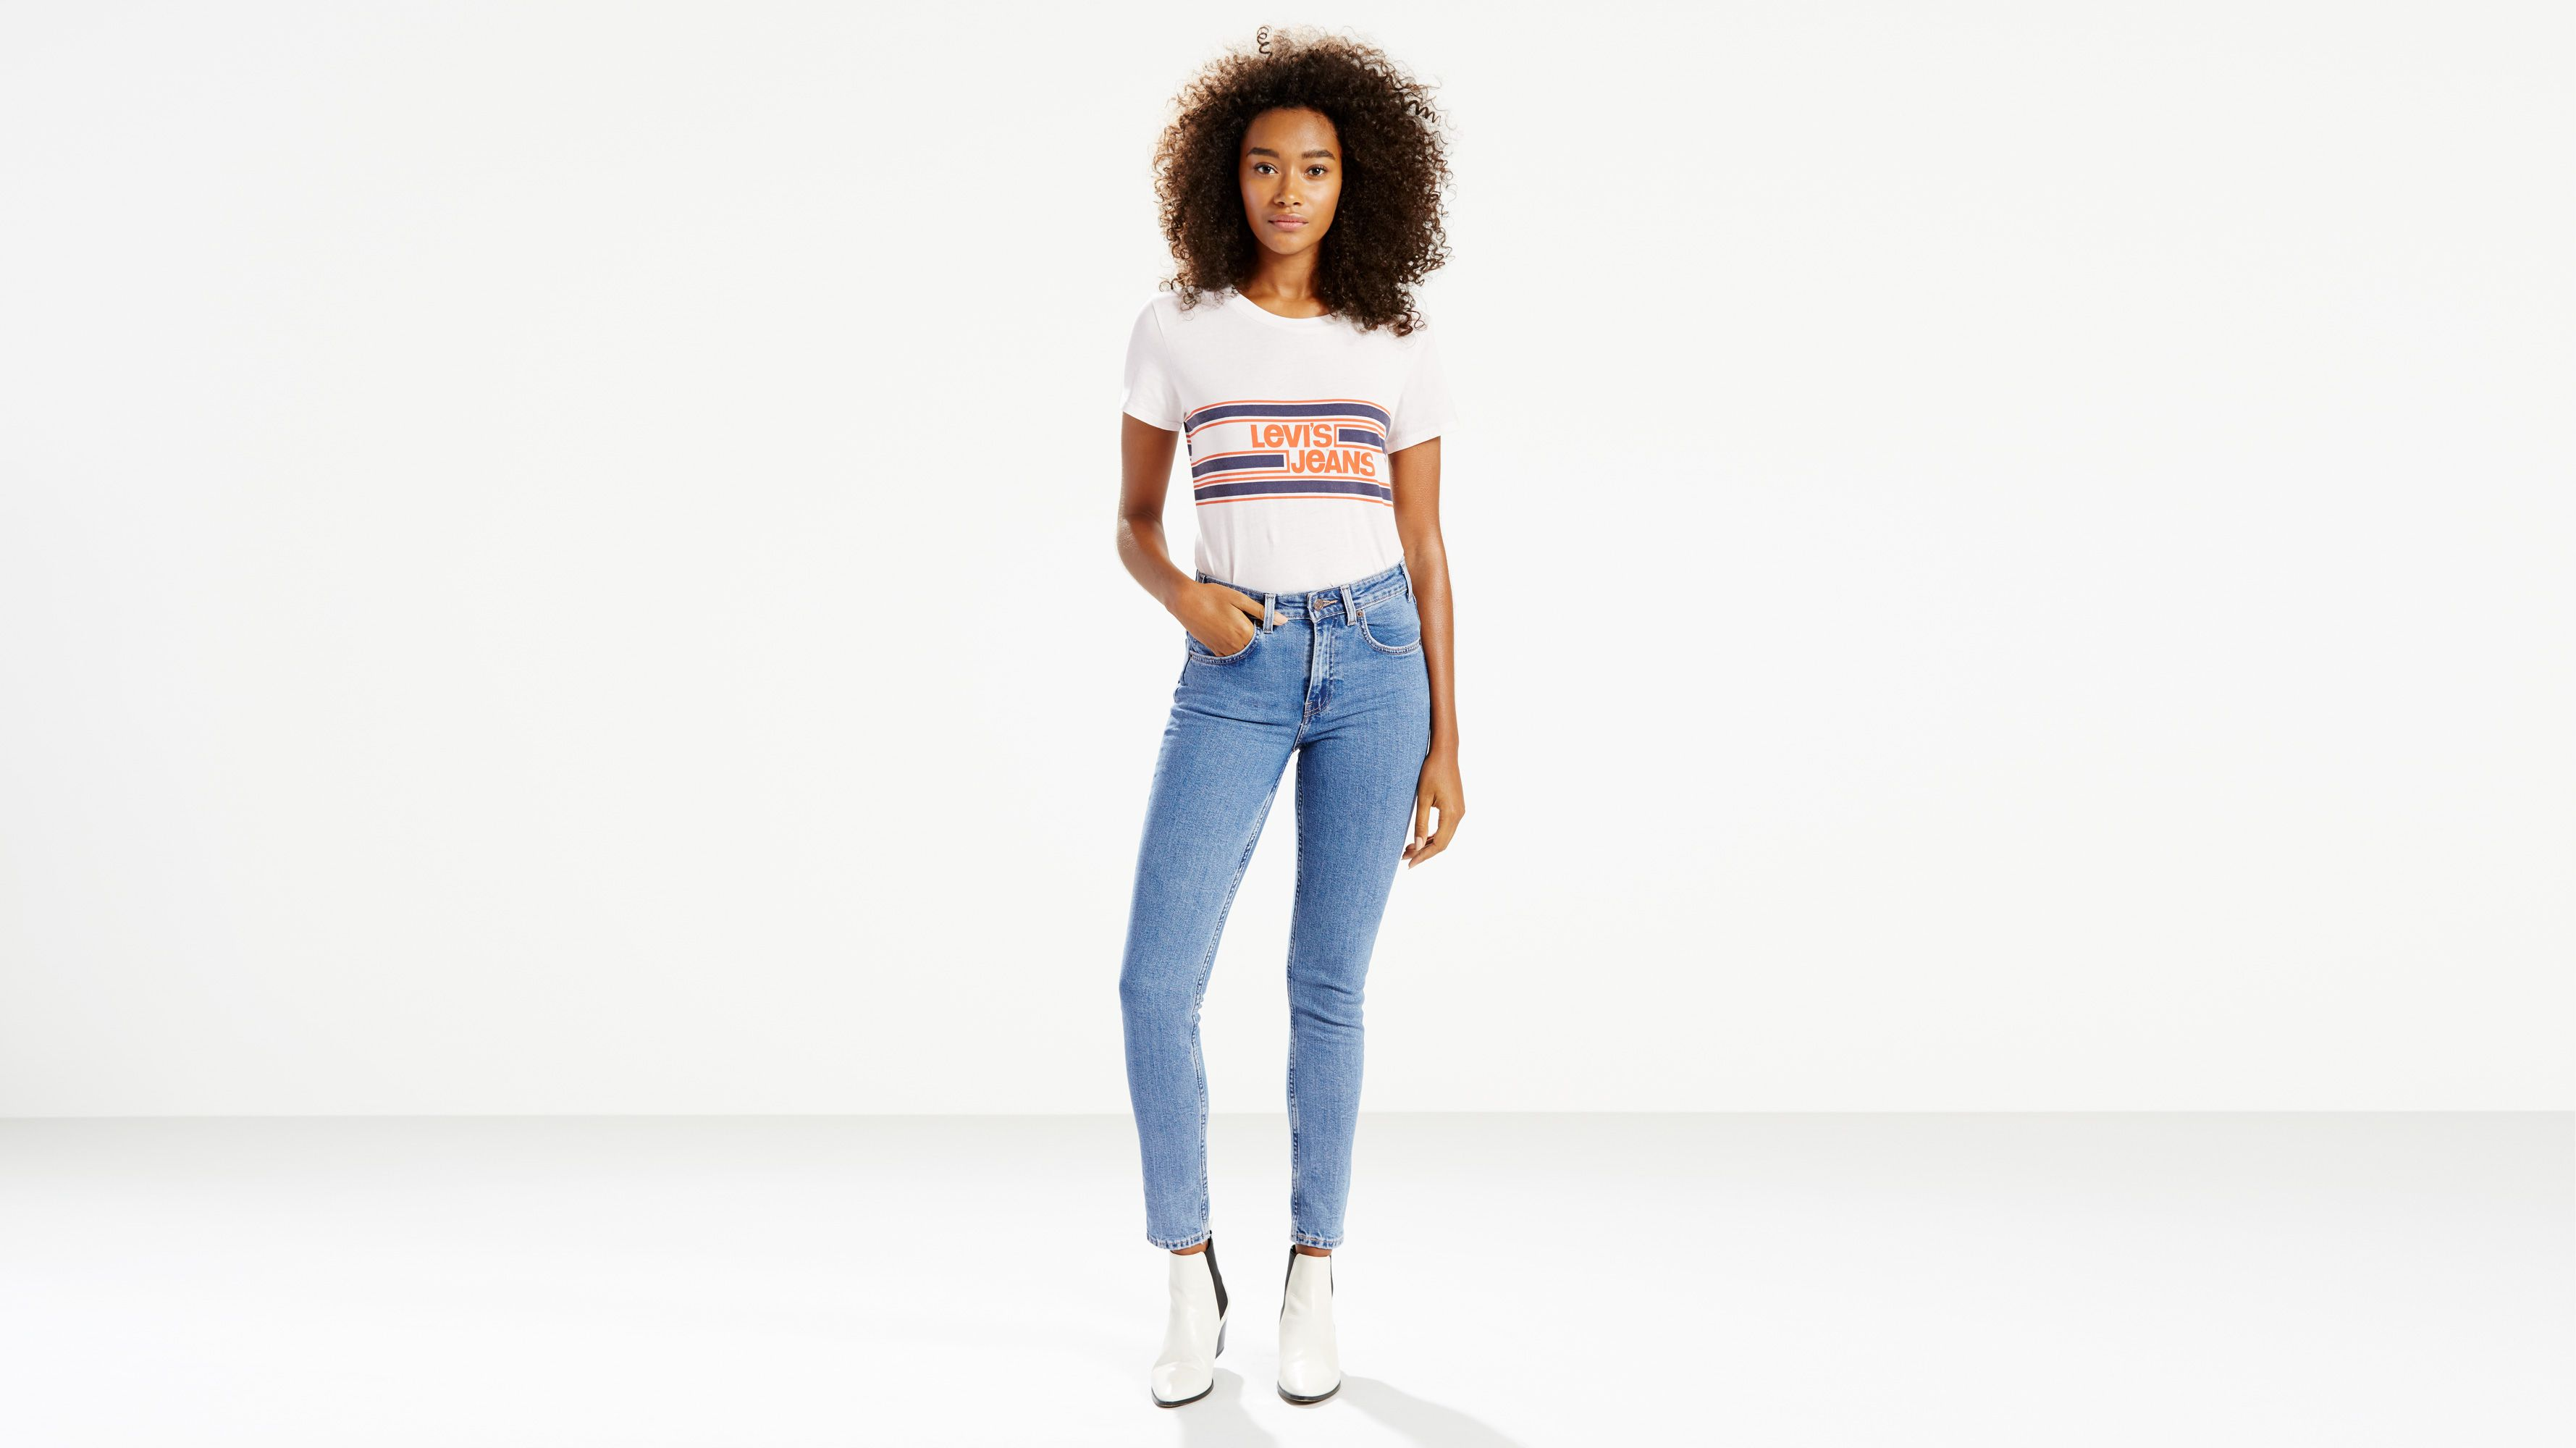 Women-Jeans-721 Vintage High Rise Skinny Jeans-Watermark